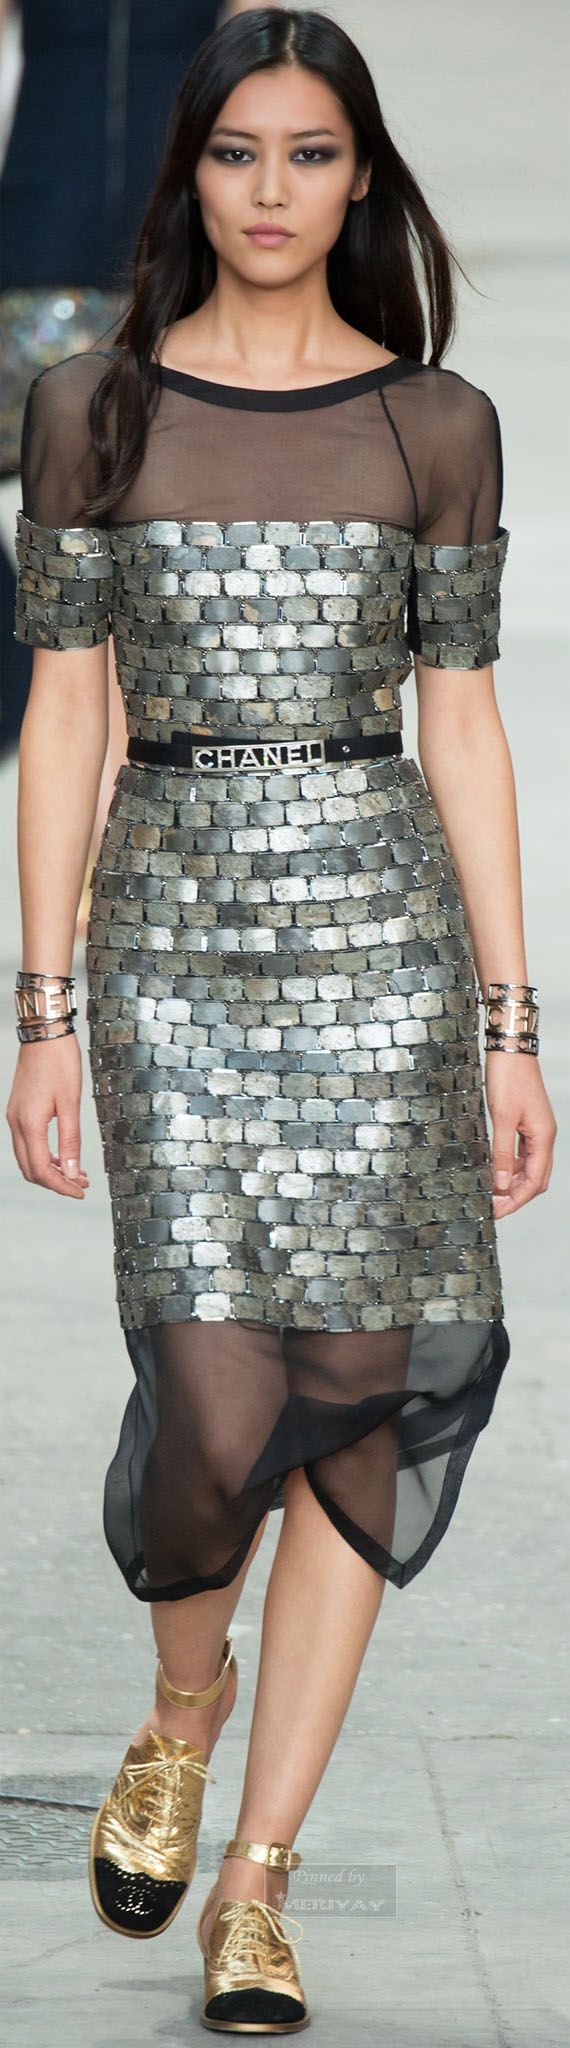 Chanel Spring 2015 #MosaicPattern  http://meikkibeibi.blogspot.fi